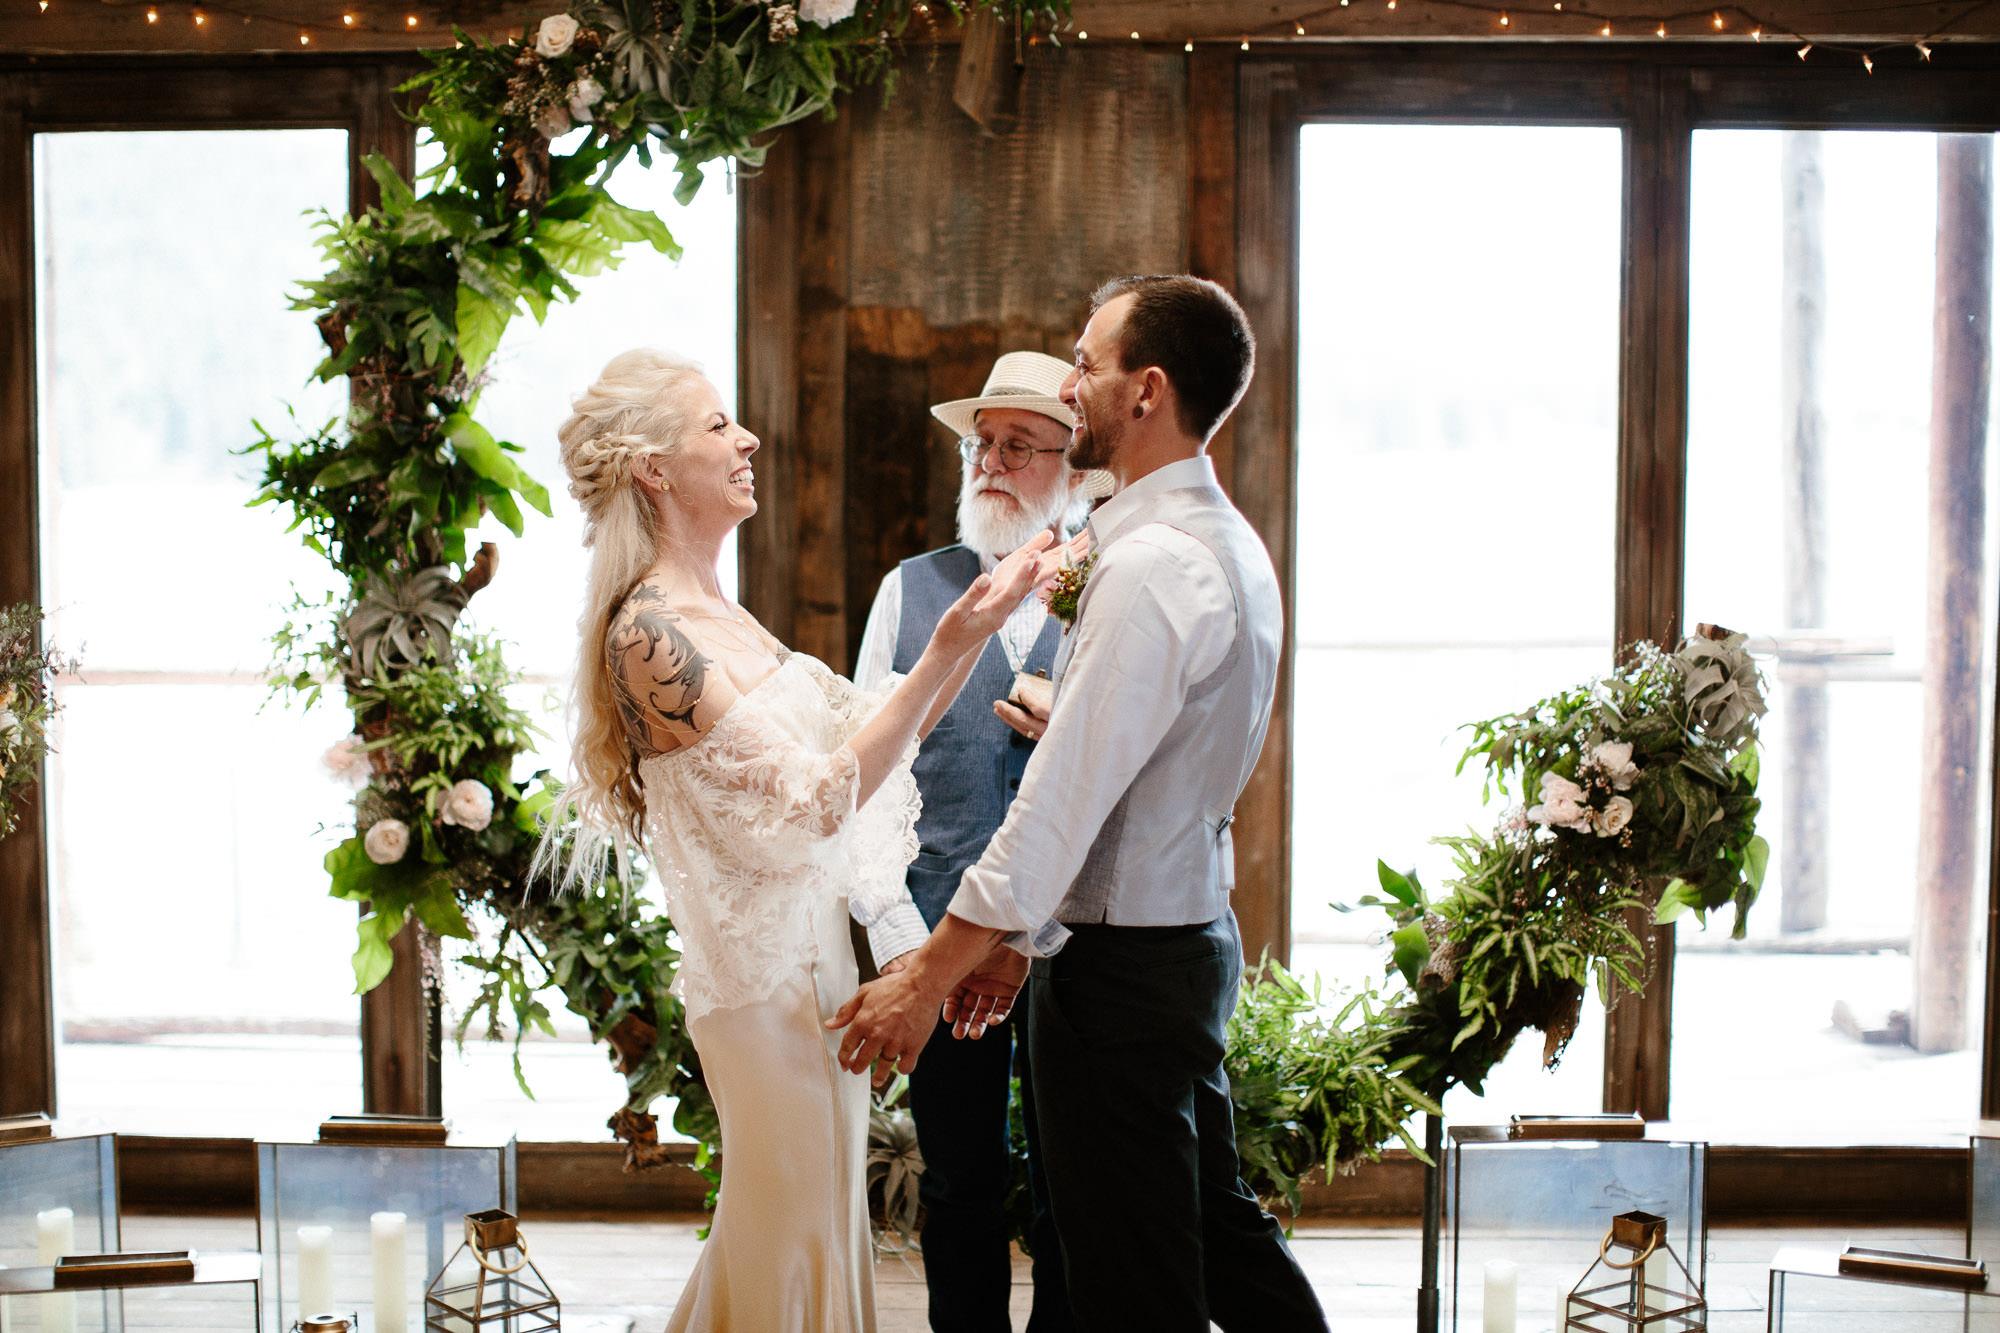 bucci-barn-wedding-elopement-evergreen-boulder-denver-colorado-adventerous-romantic-timeless-062.jpg